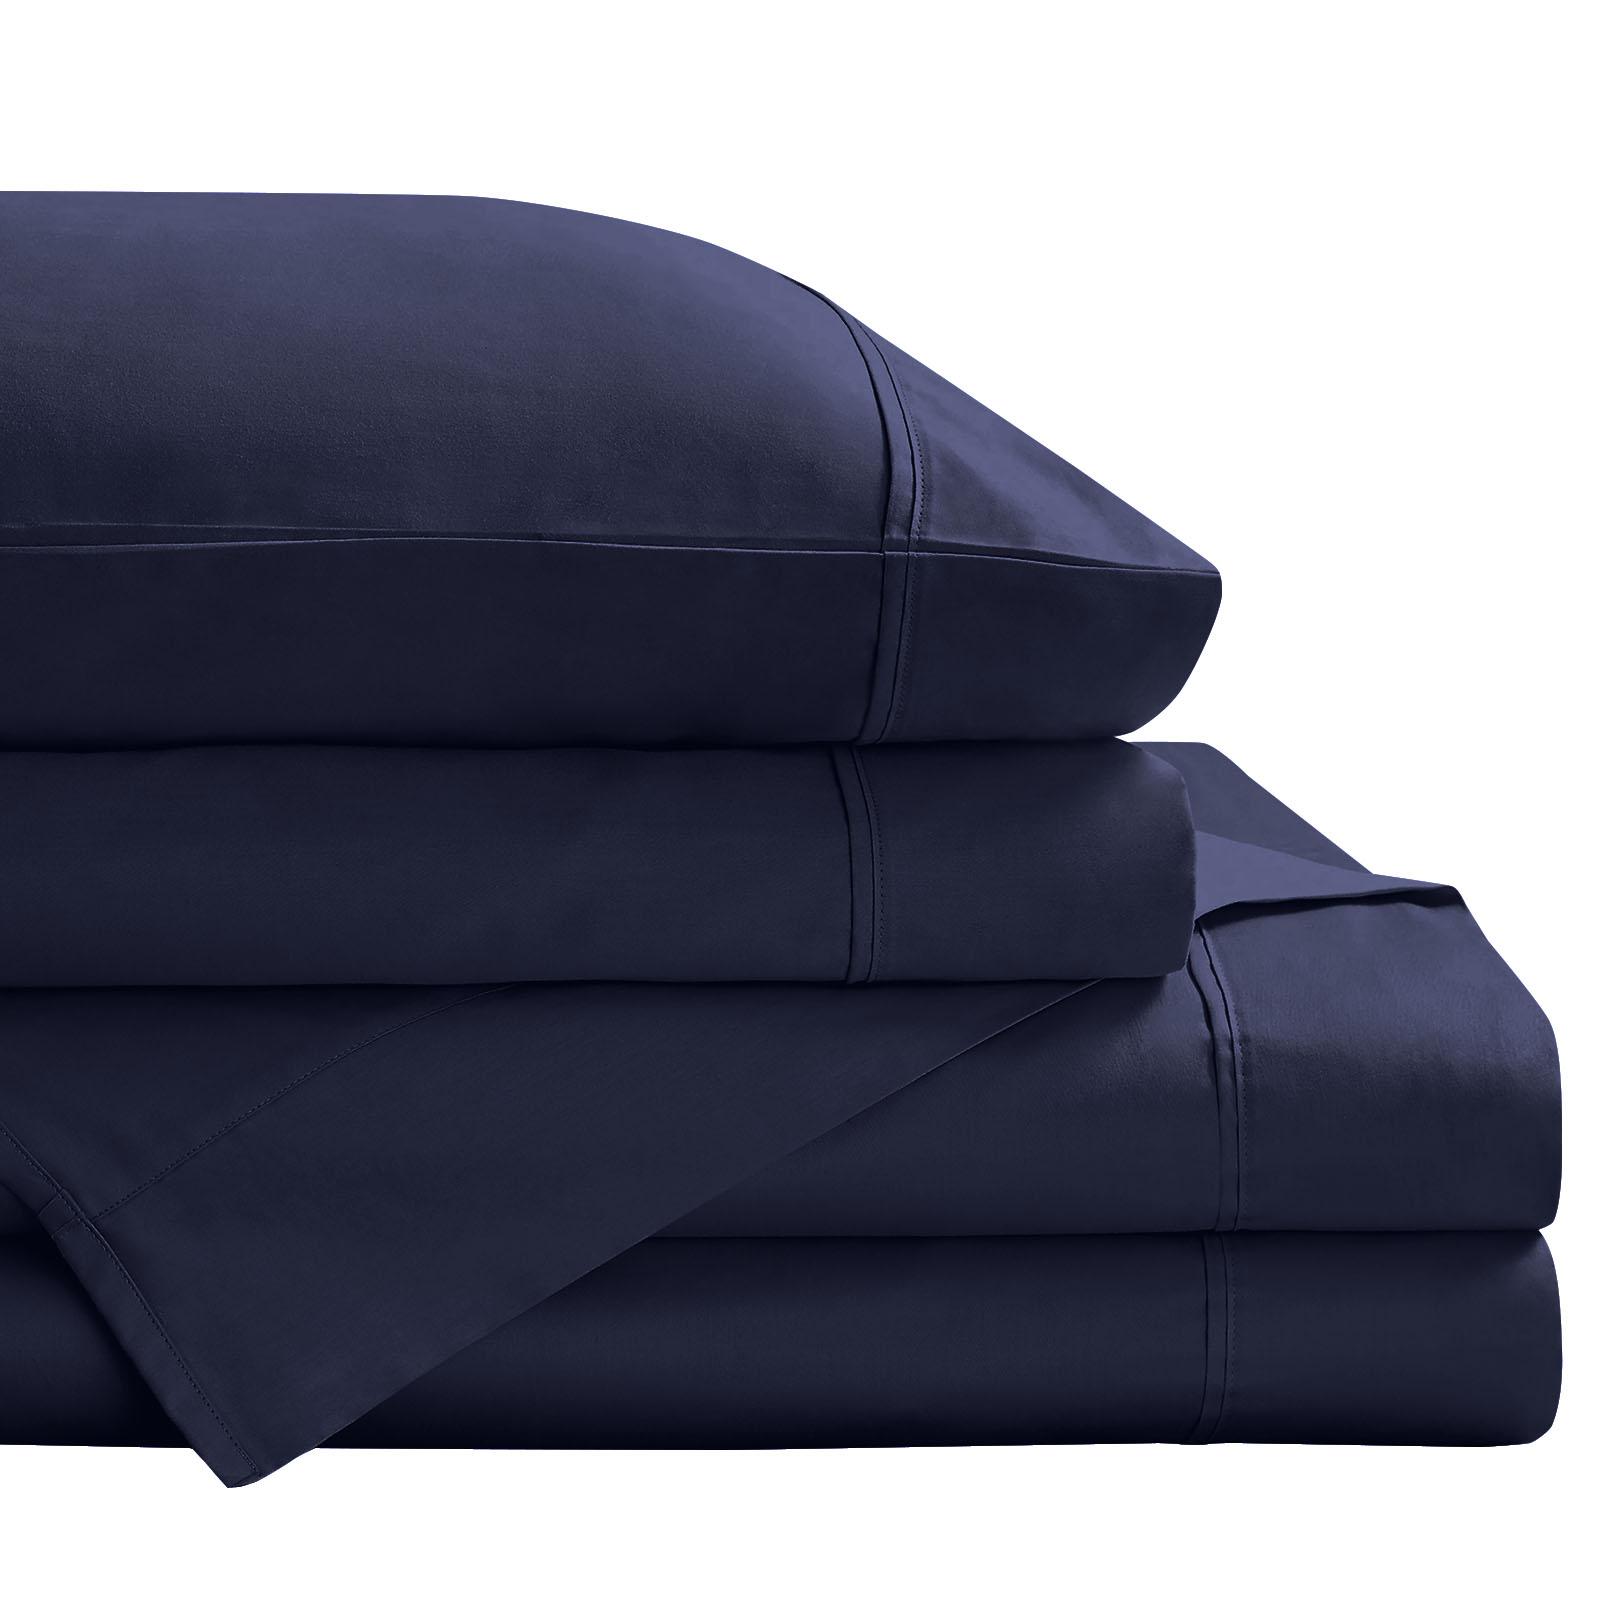 thumbnail 73 - Royal Comfort 1000TC Hotel Grade Bamboo Cotton Sheets Pillowcases Set Ultrasoft